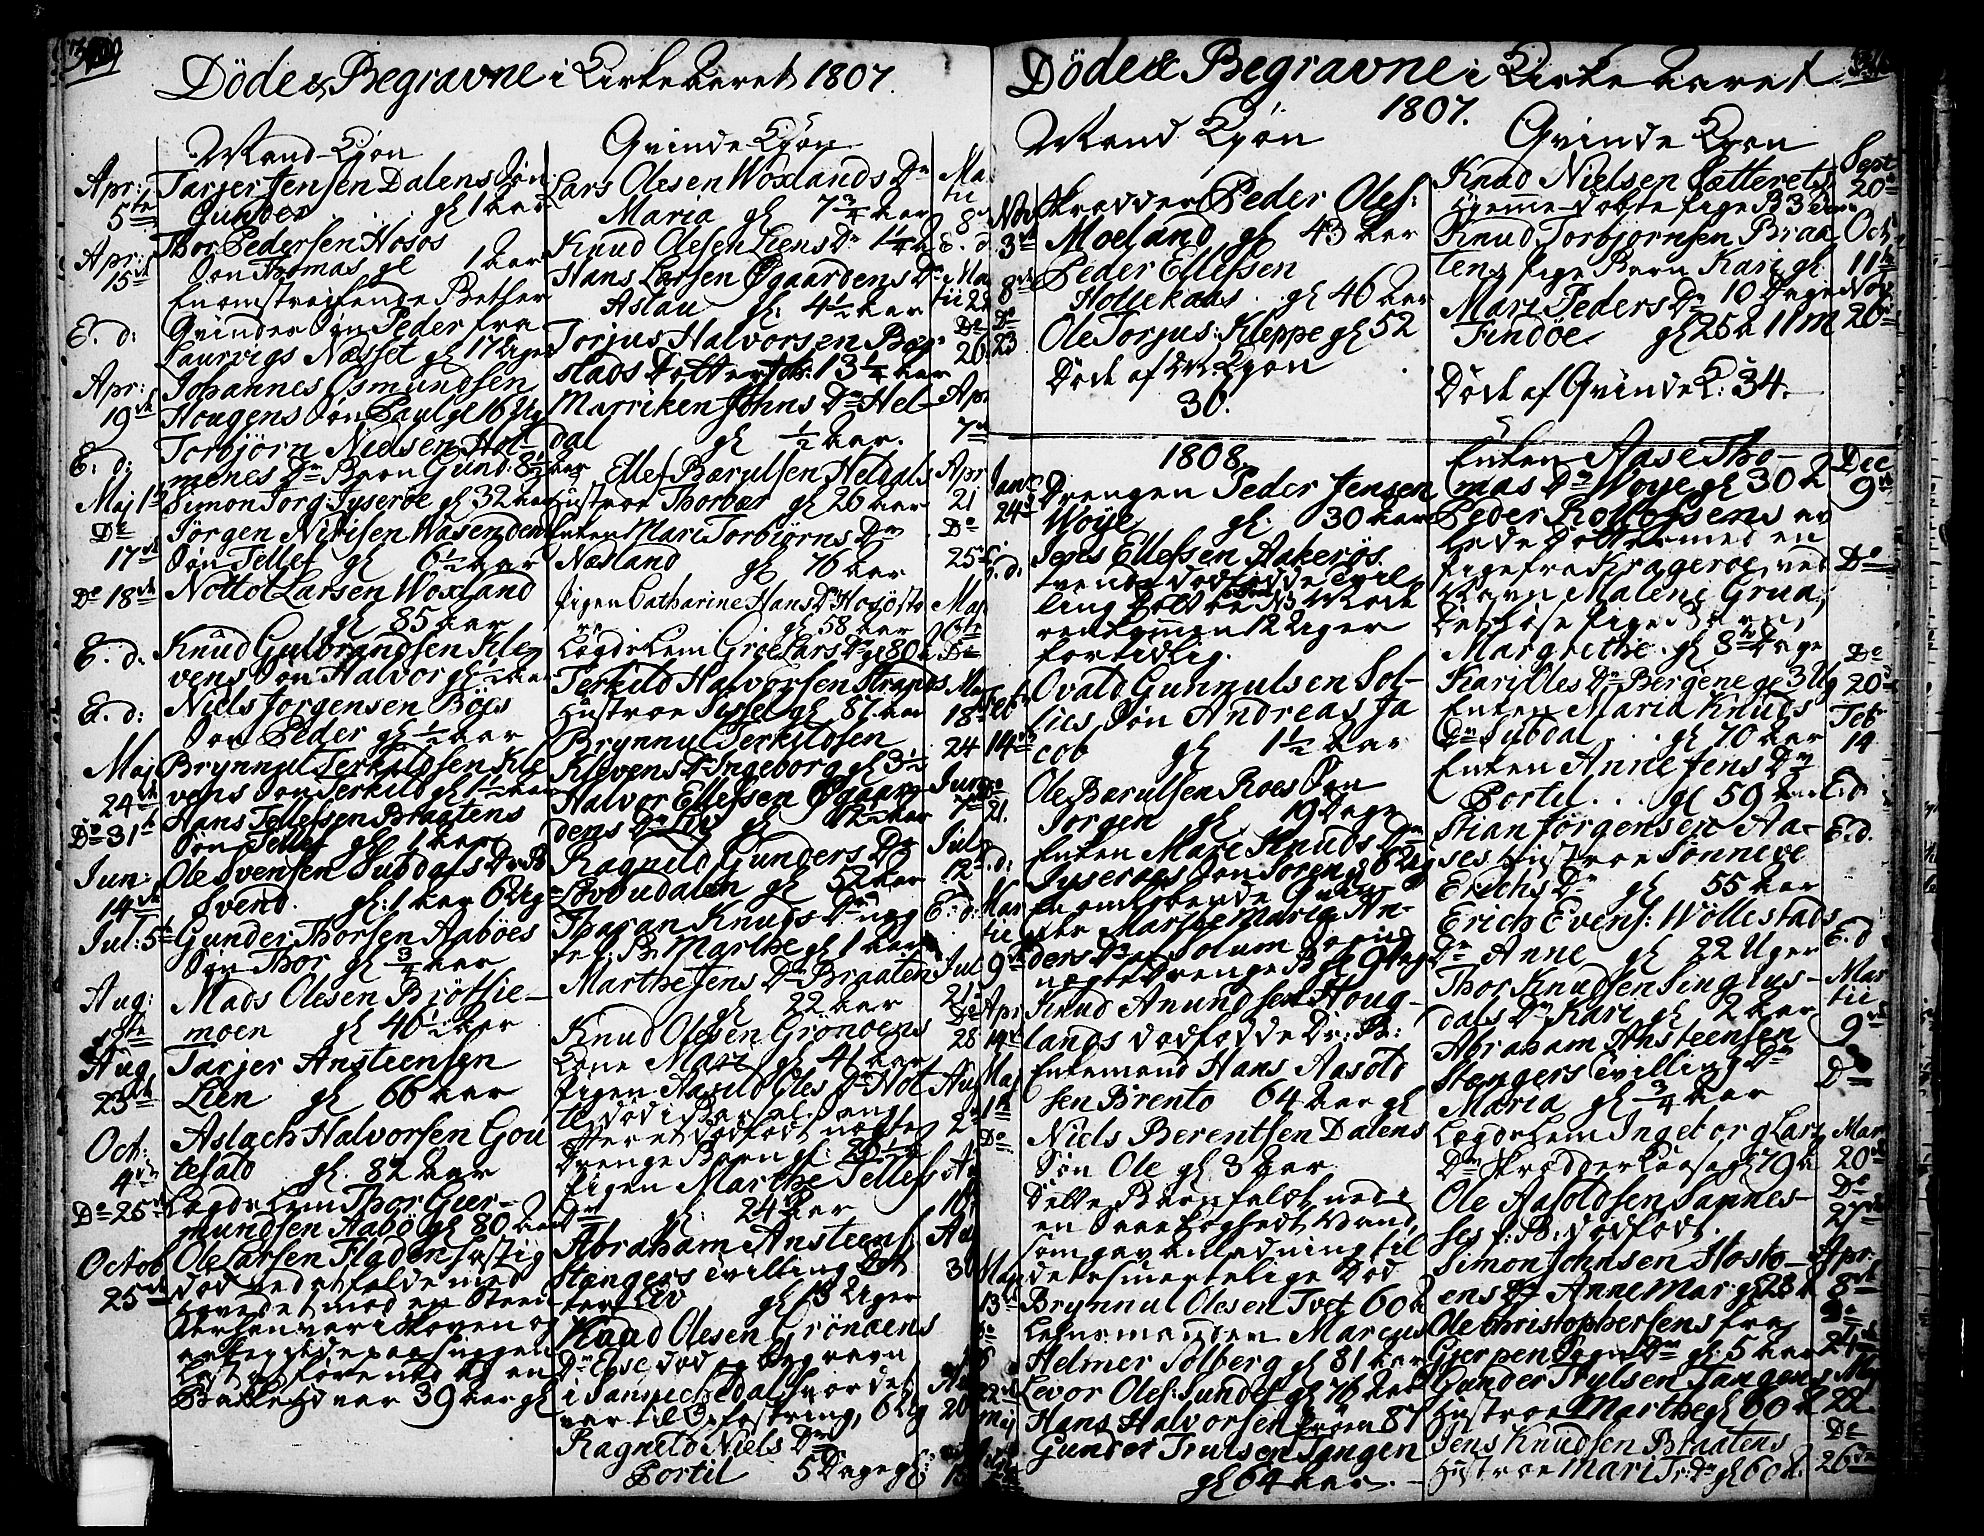 SAKO, Drangedal kirkebøker, F/Fa/L0003: Ministerialbok nr. 3, 1768-1814, s. 309-310